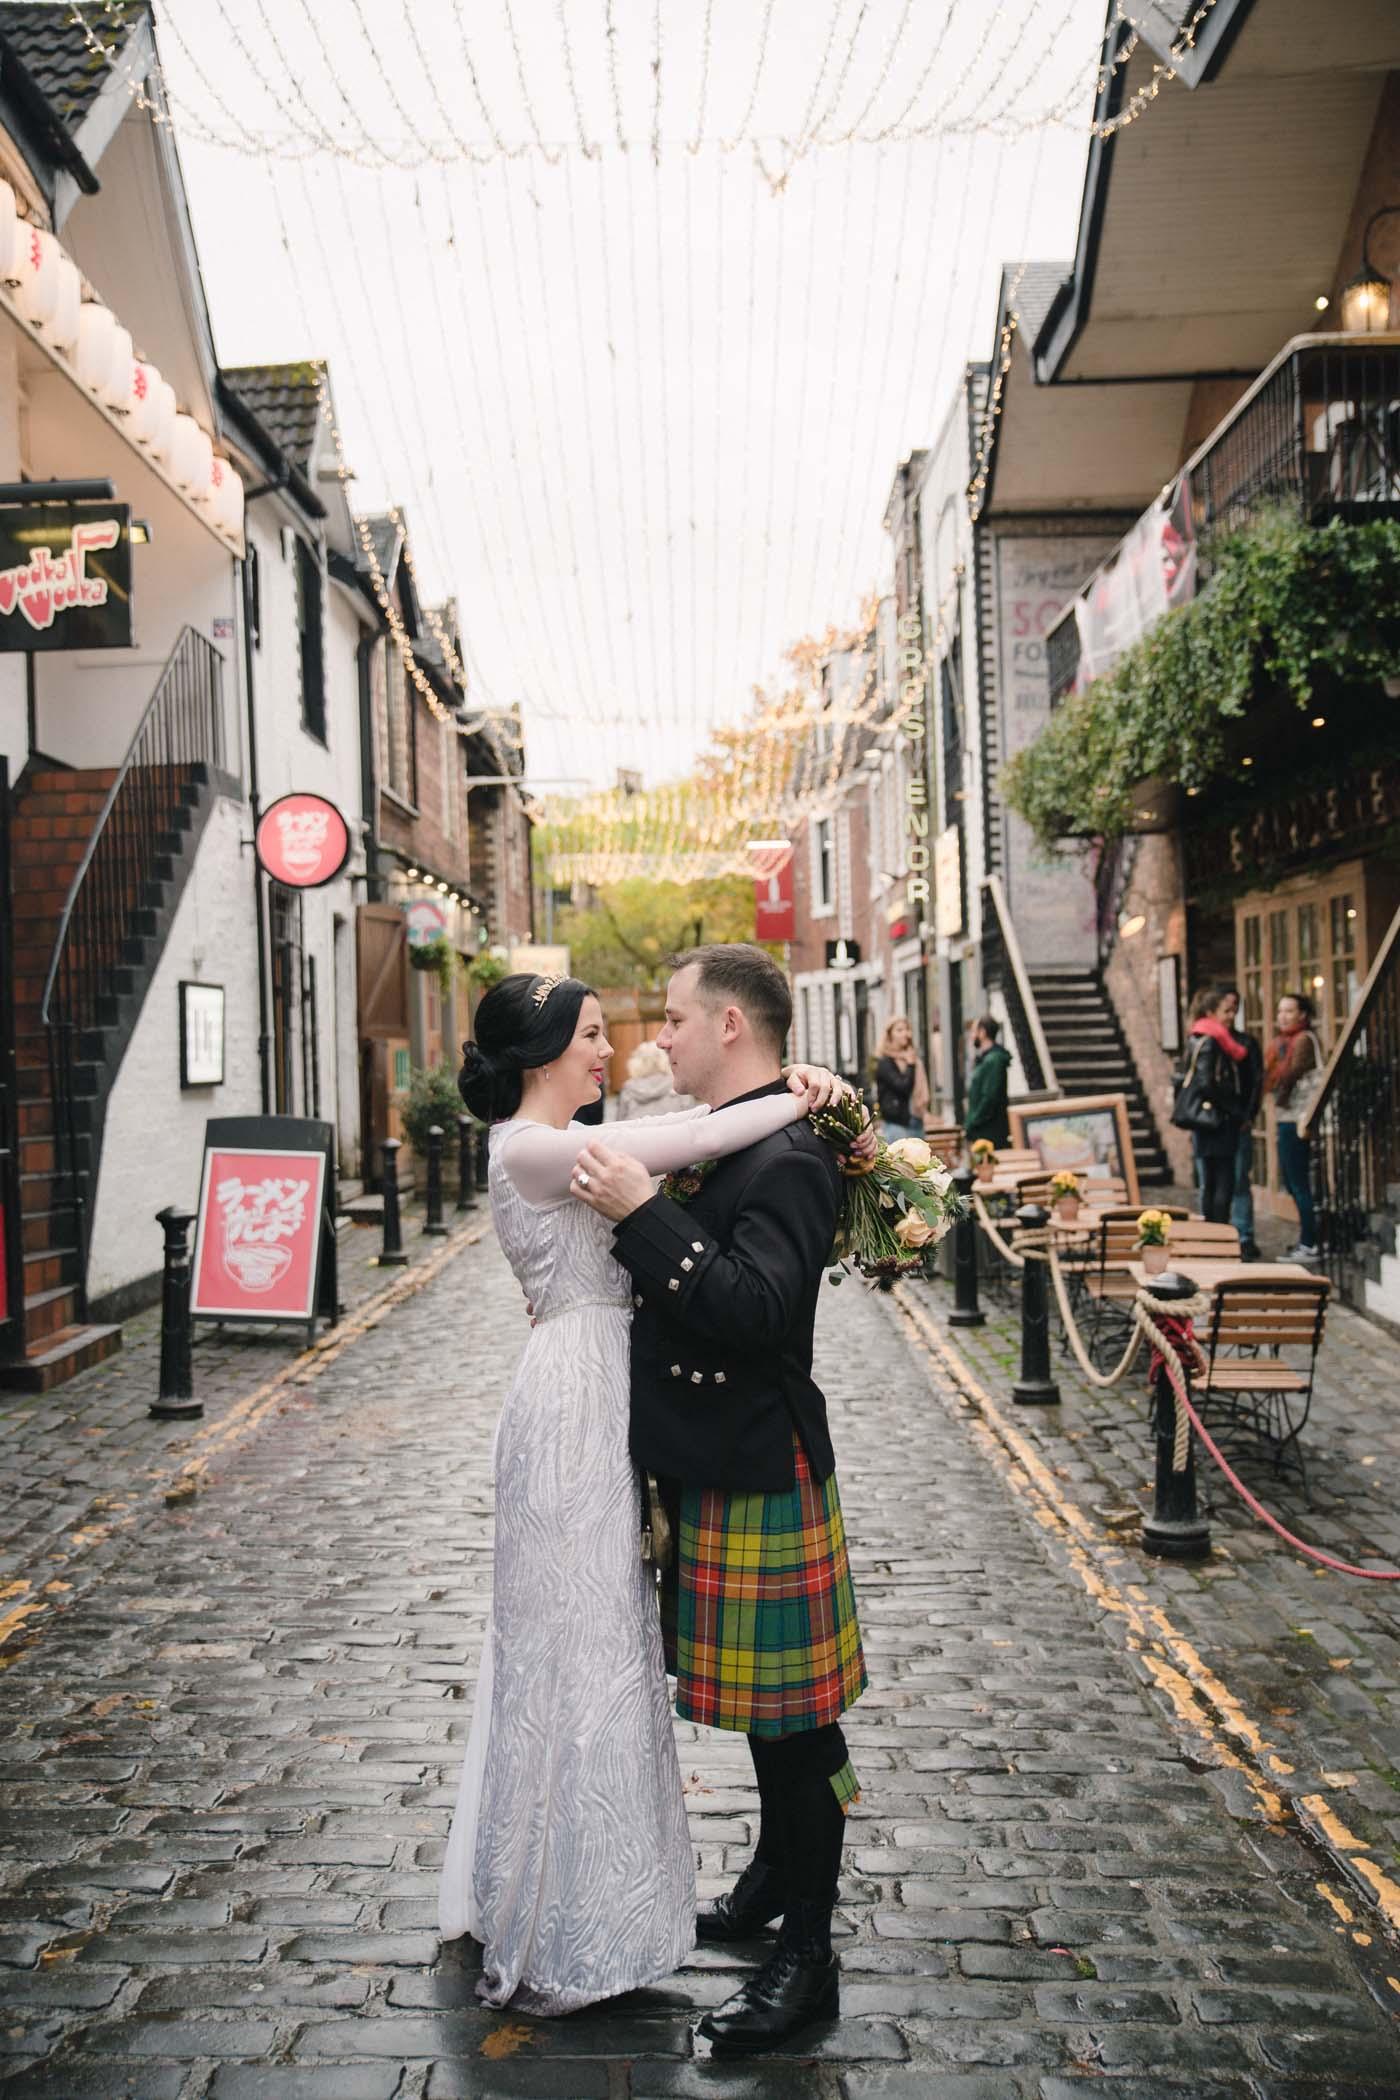 Glasgow West End Wedding Photography inspiration